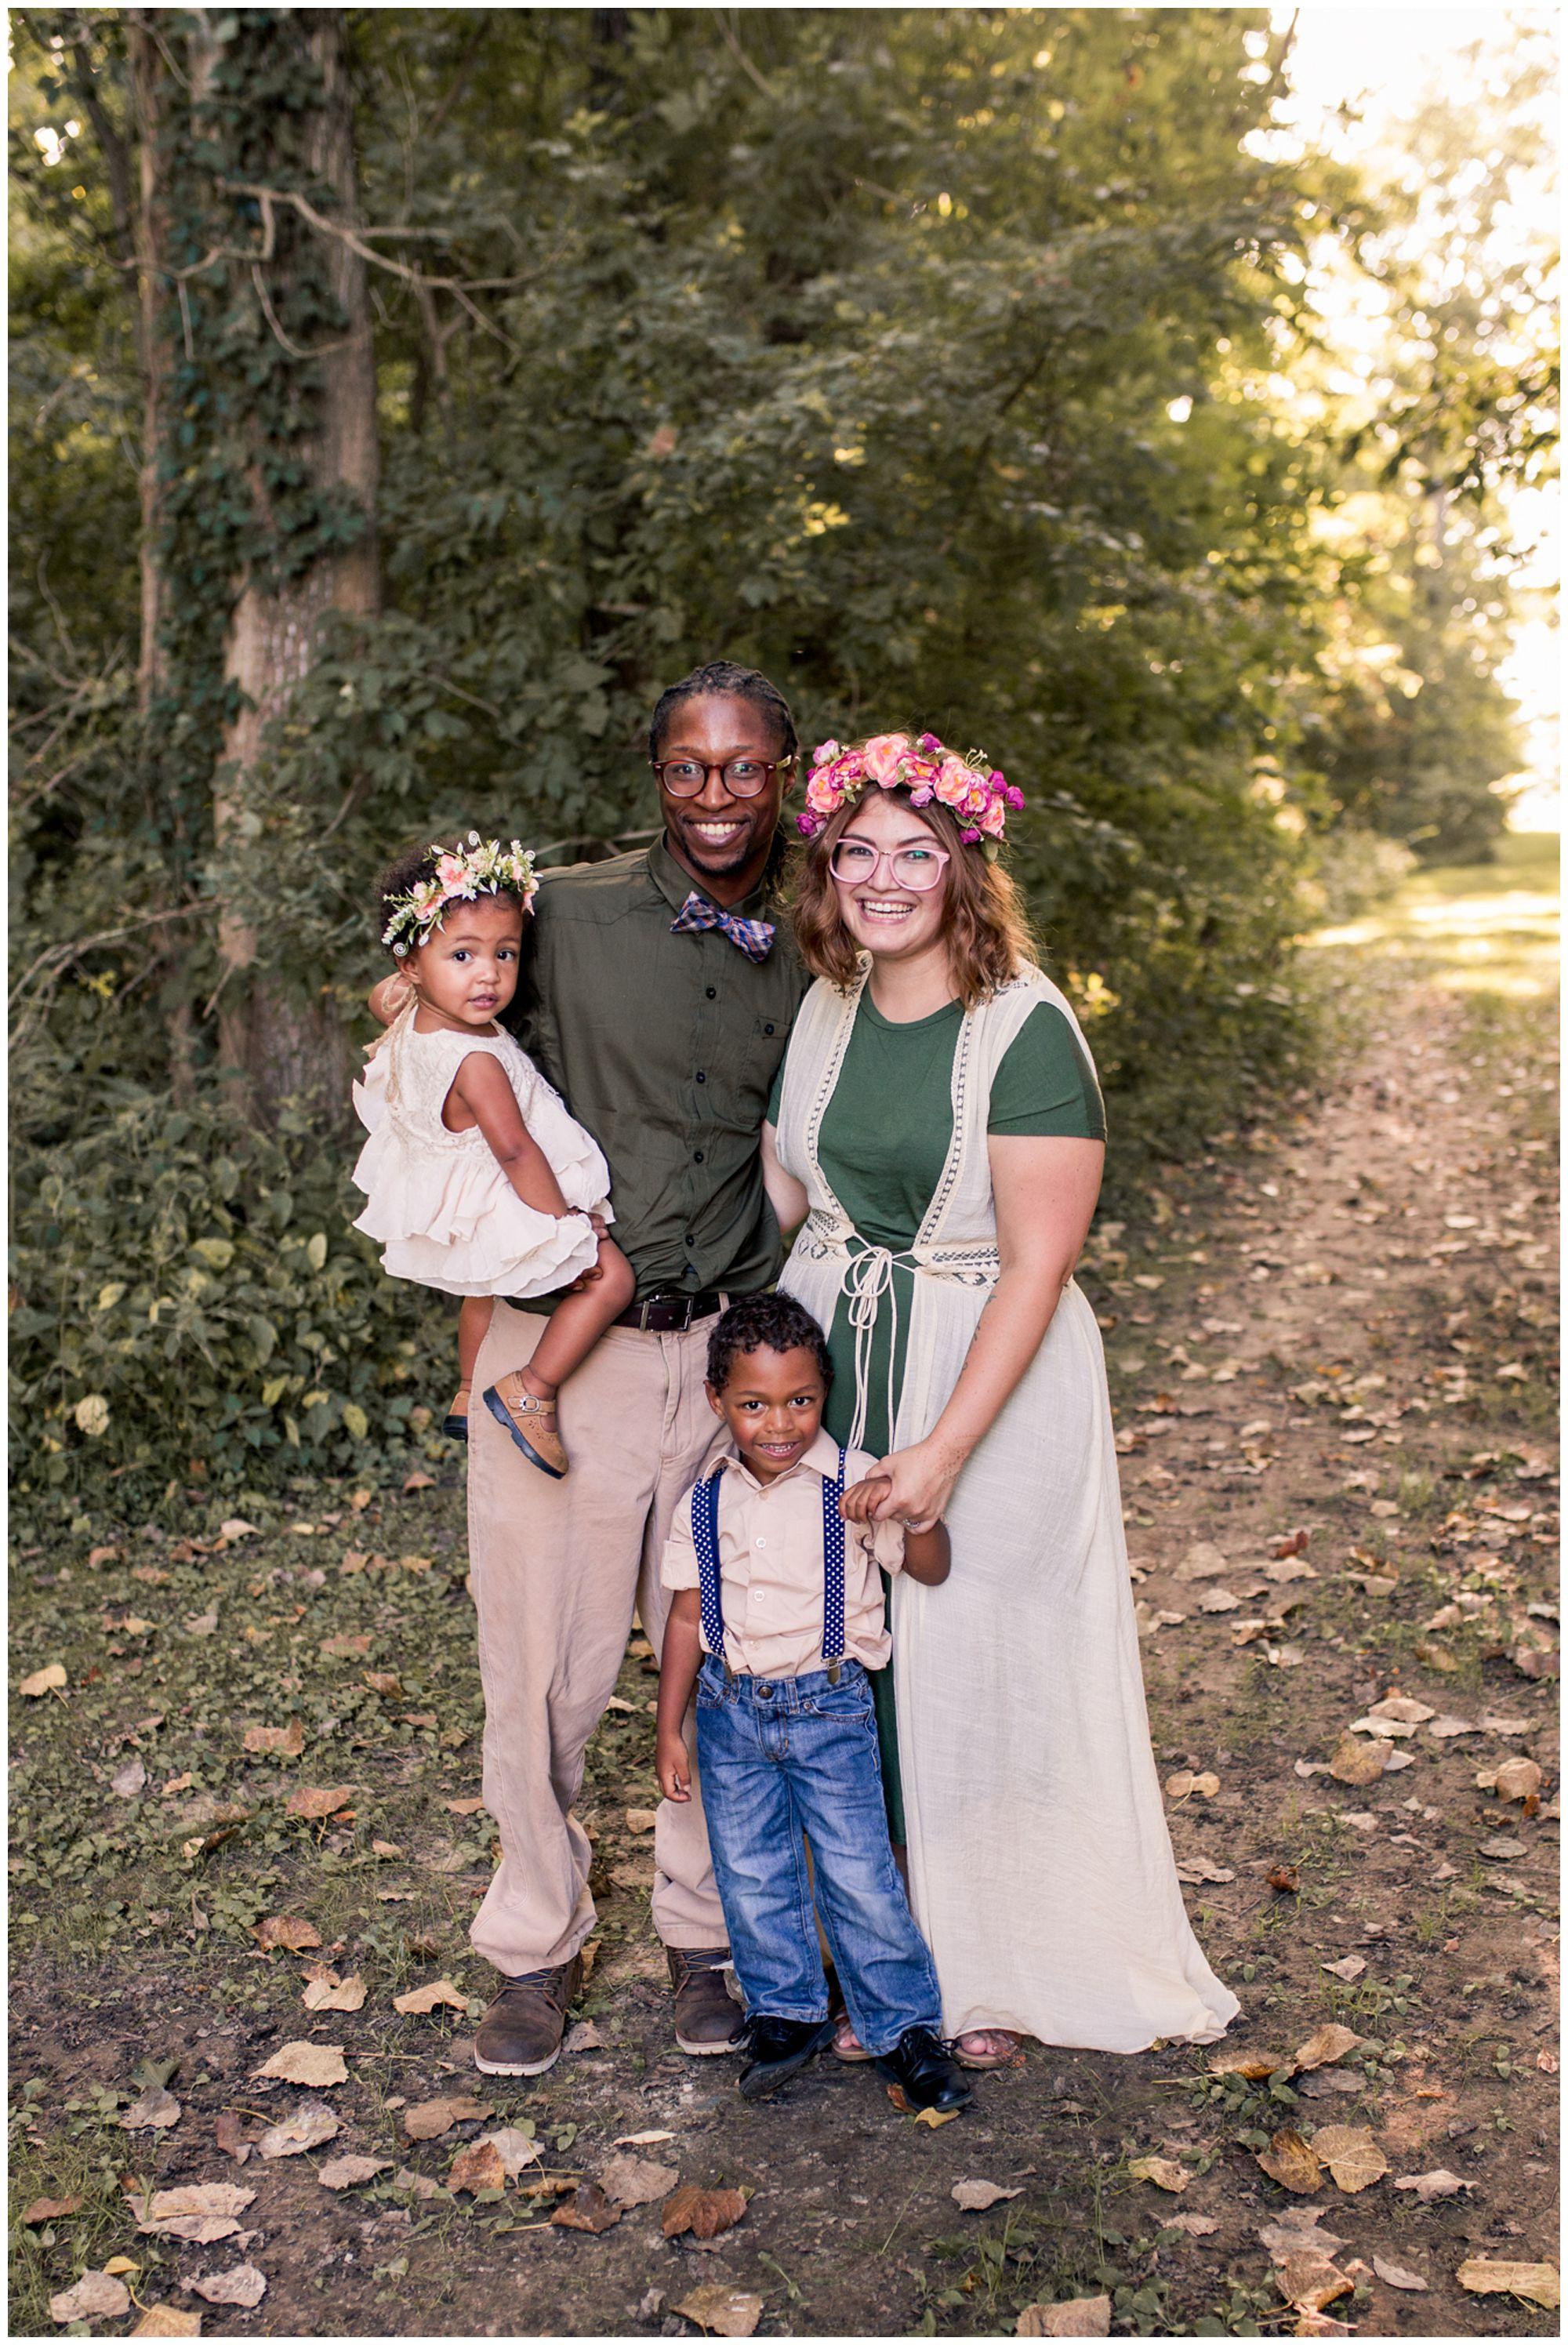 Kokomo family session in woods at Jackson Morrow Park